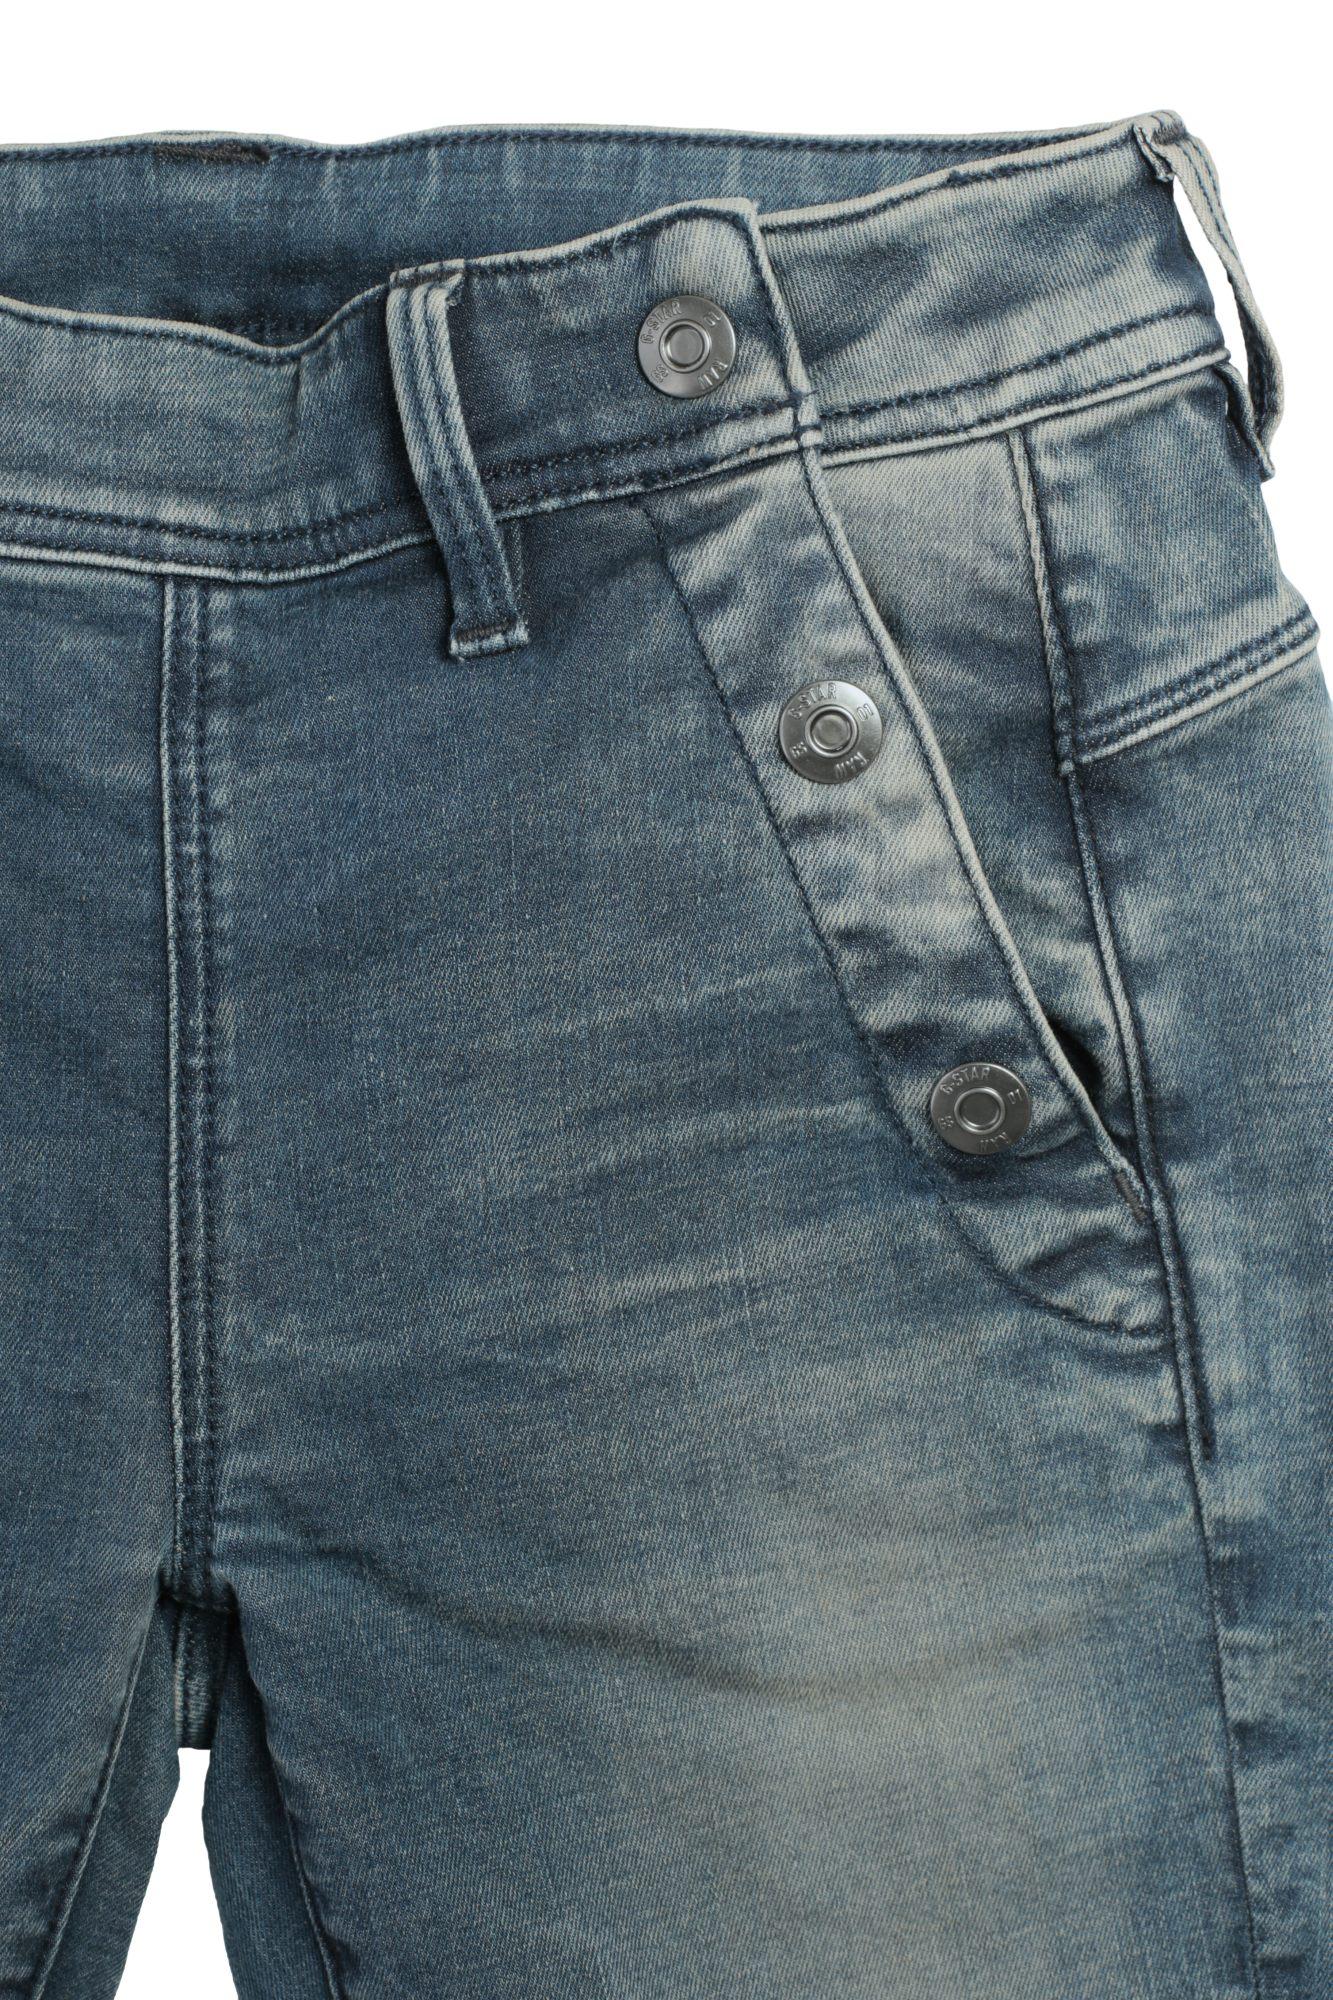 G Star Lynn Mid Skinny Wmn Damen Raw Denim Jeans Hose Pants Röhrenjeans Stretch